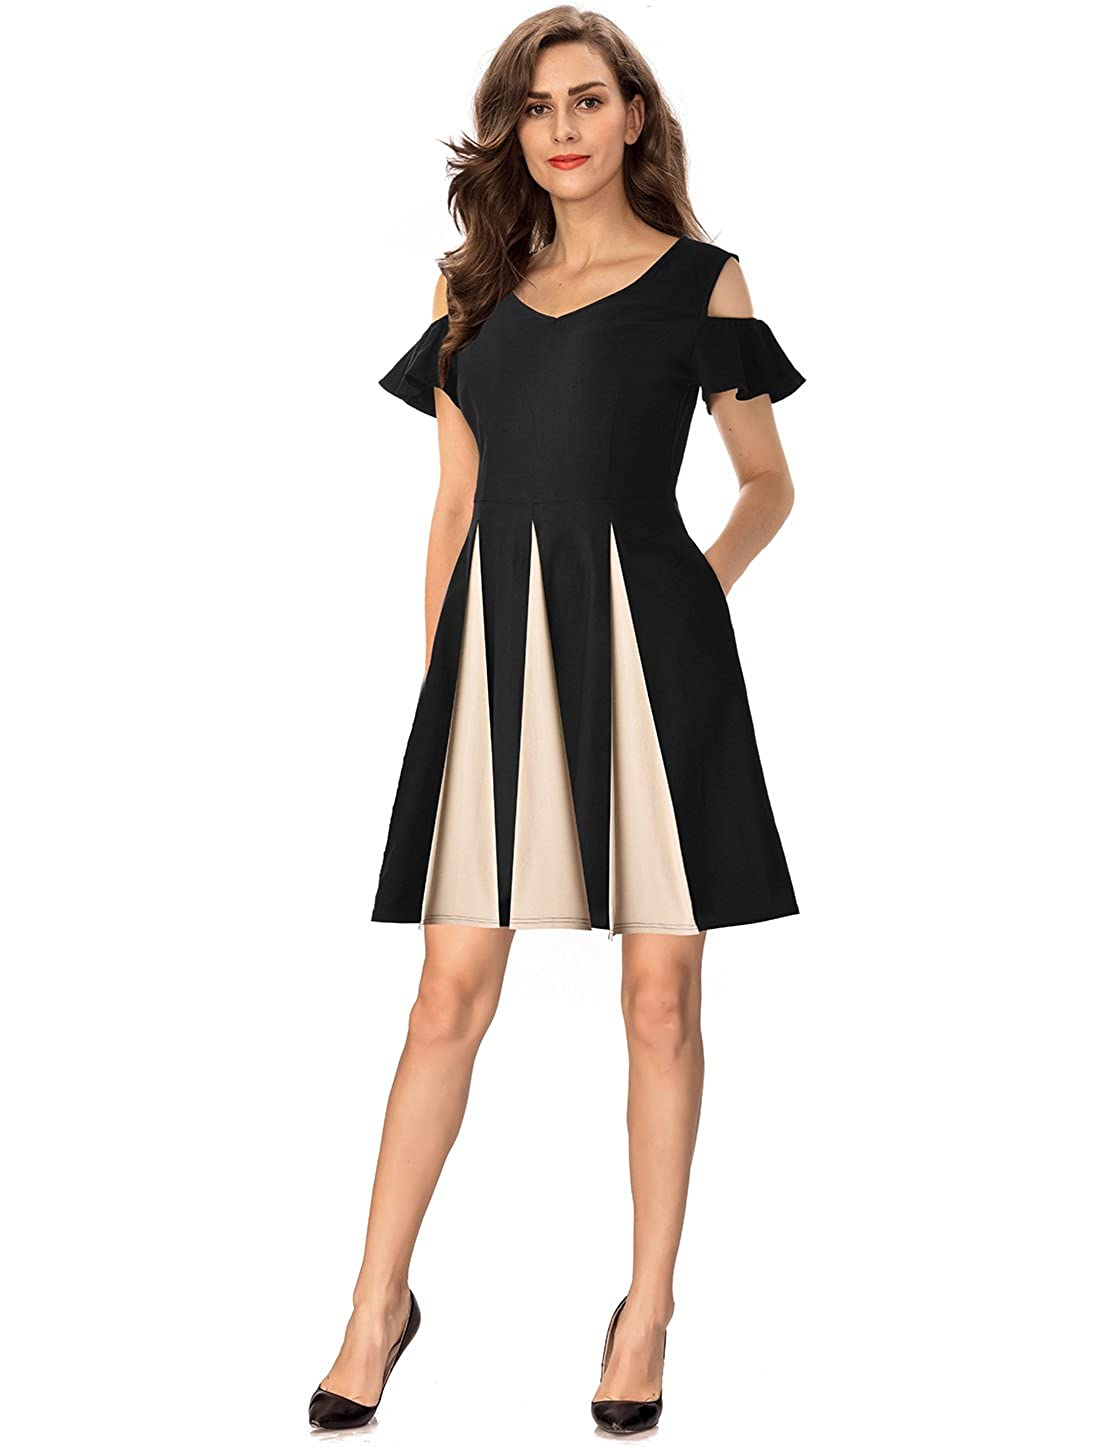 07ad960b95e Top4  InsNova Women s Cold Shoulder Colorblock Big Swing Graduation Party  Skater Dress